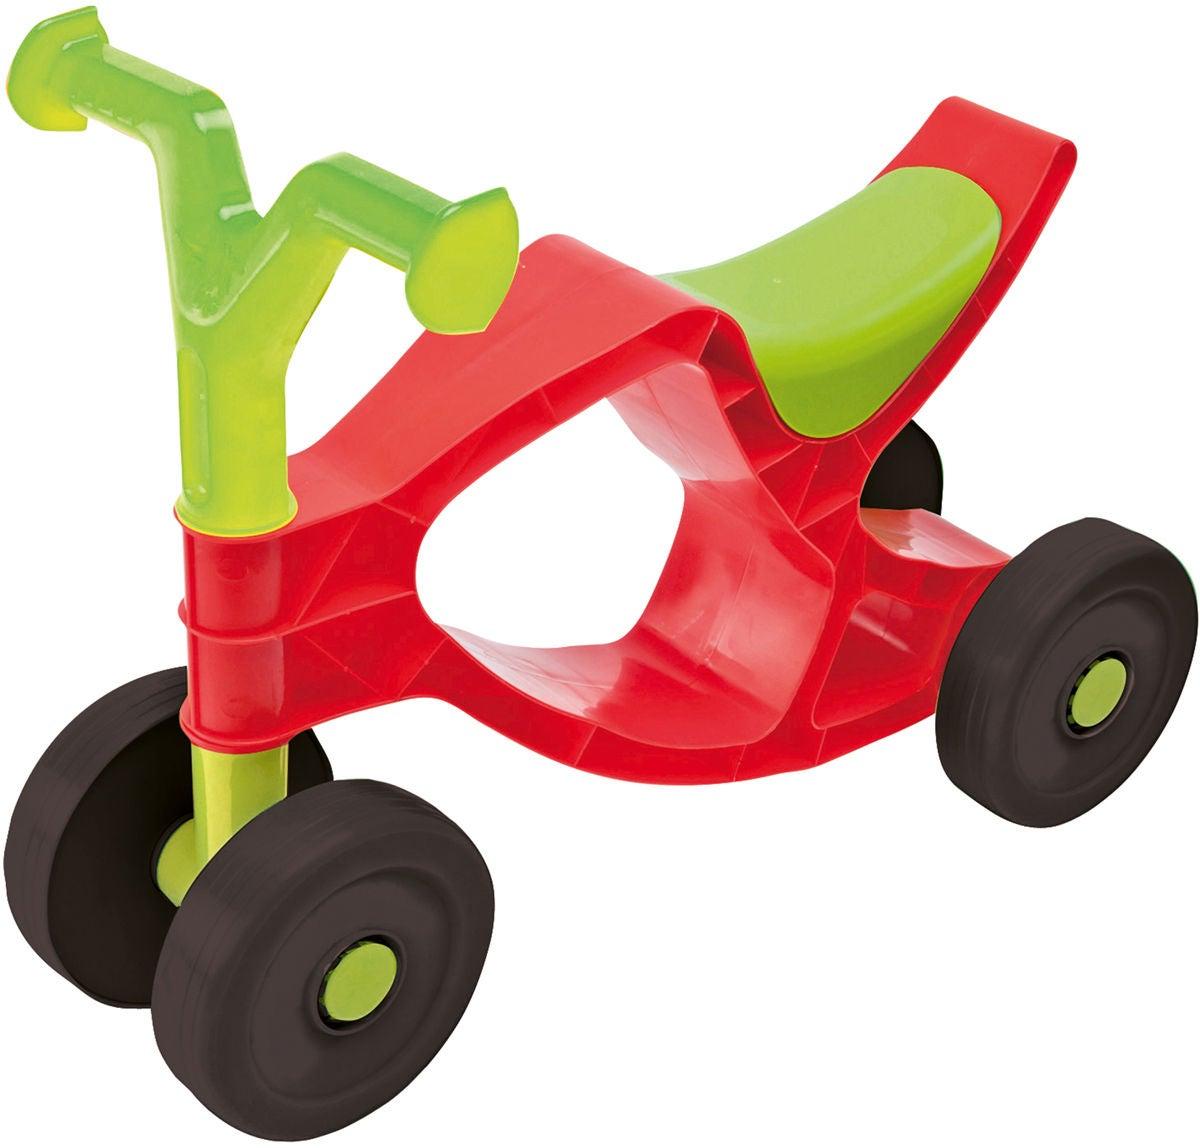 BIG Springcykel Flippi, Röd/Grön